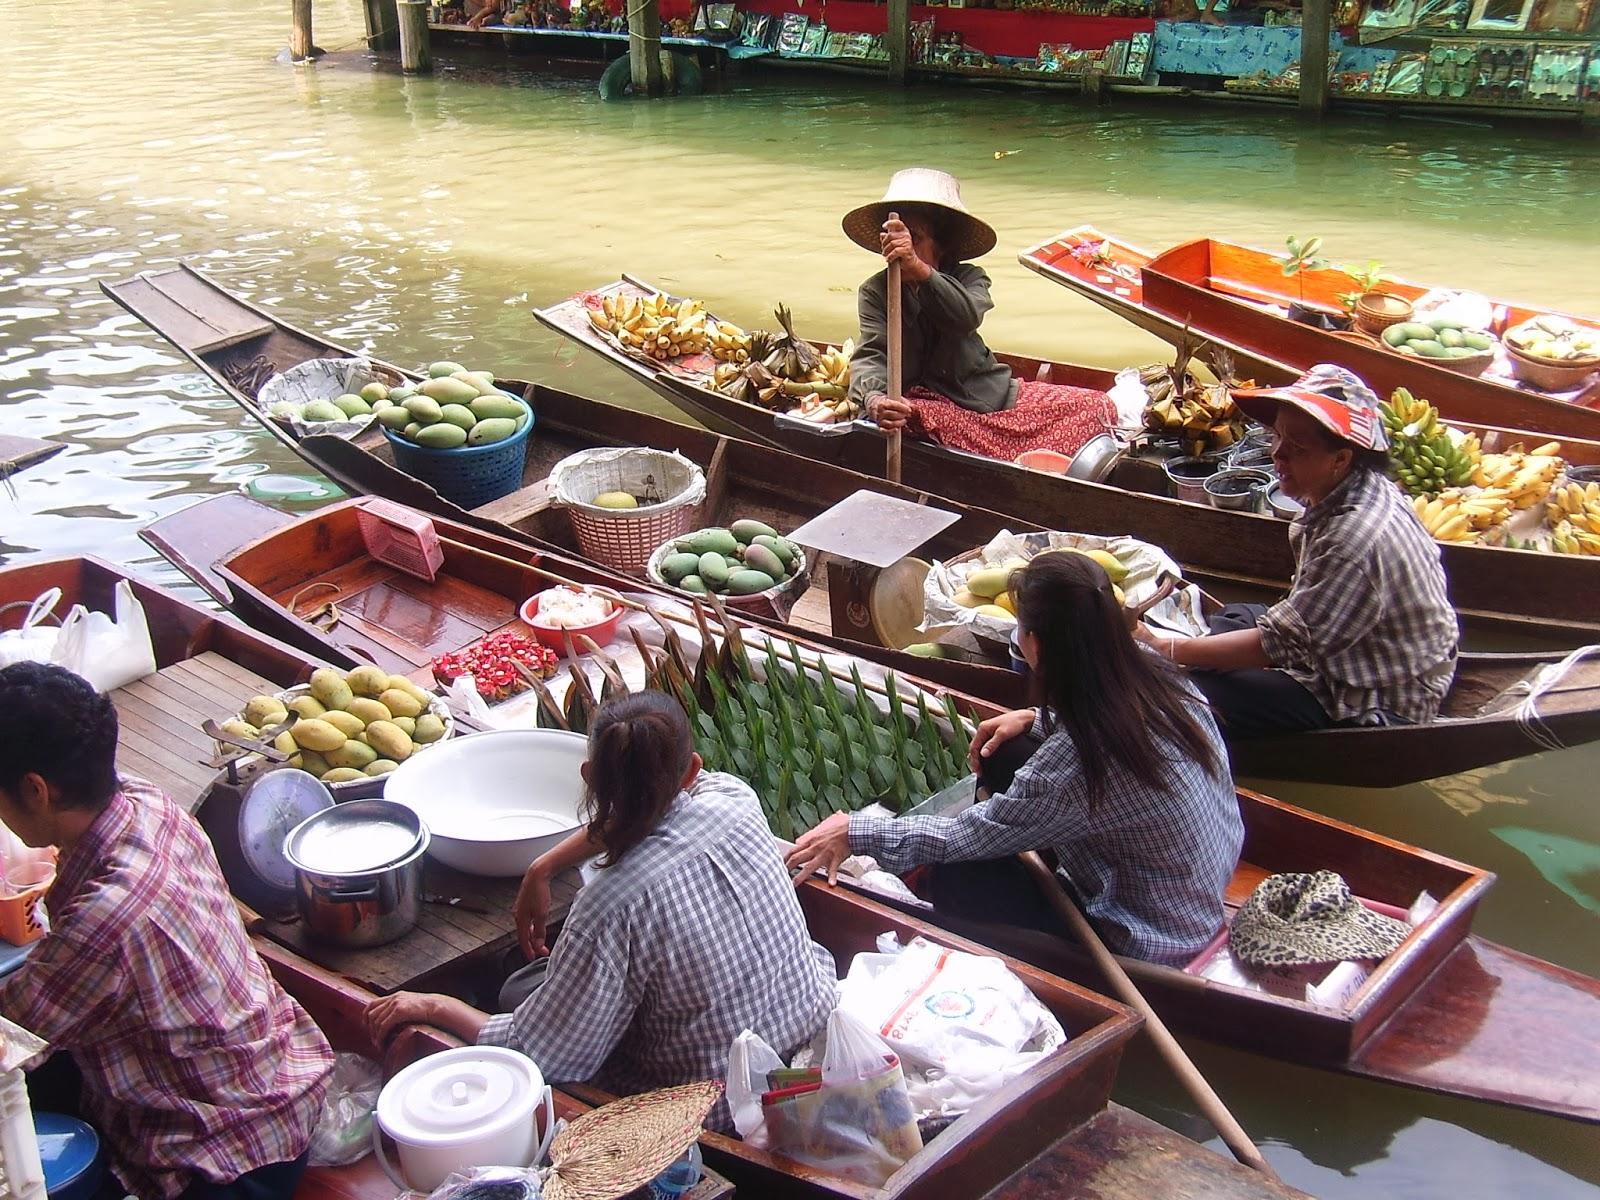 chicas de compañia en santiago tailandés